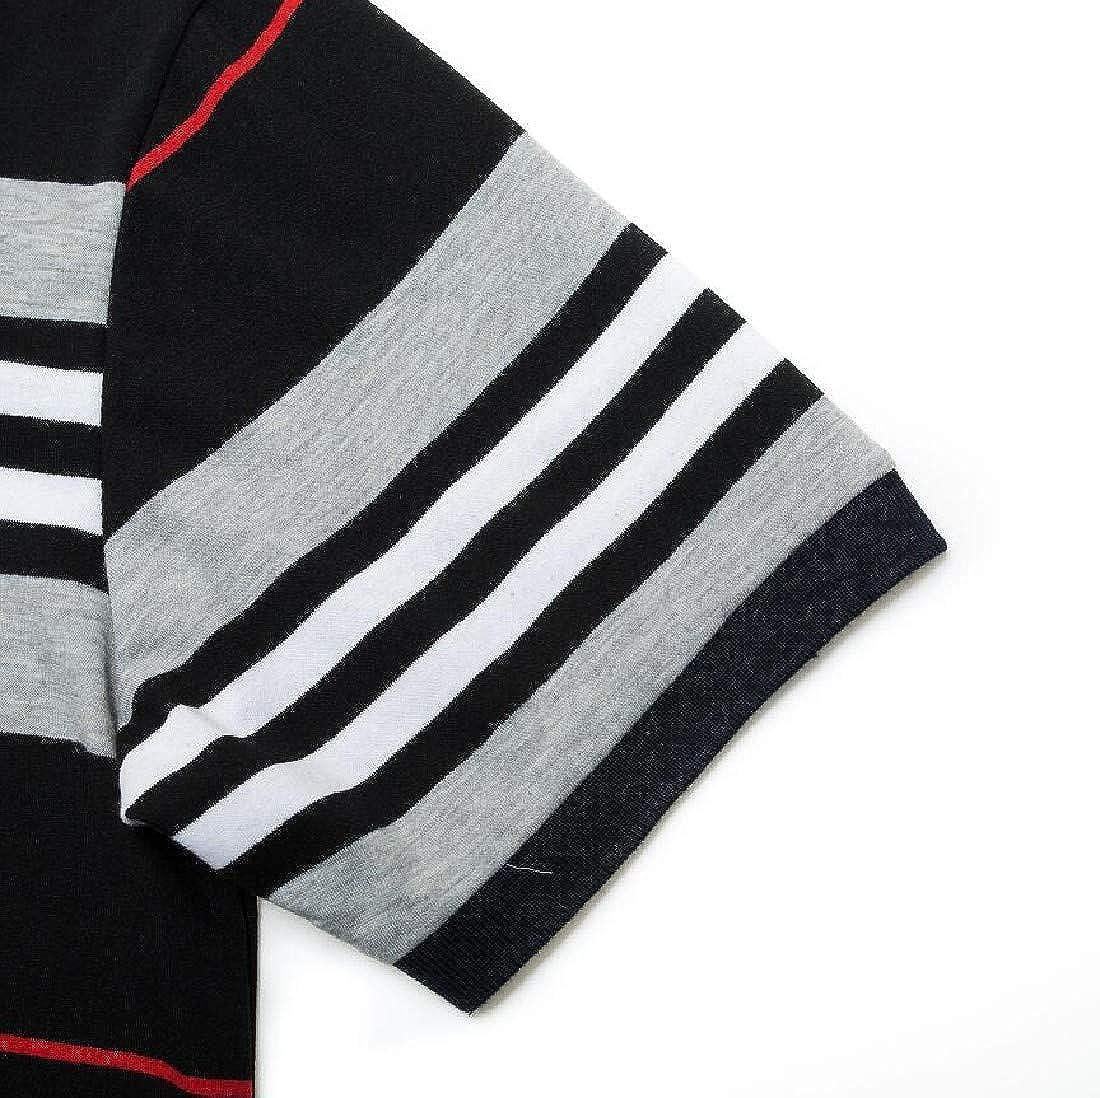 Zimaes-Men Polo Wide Stripe Short Sleeves Lapel Shirt Top T-Shirt